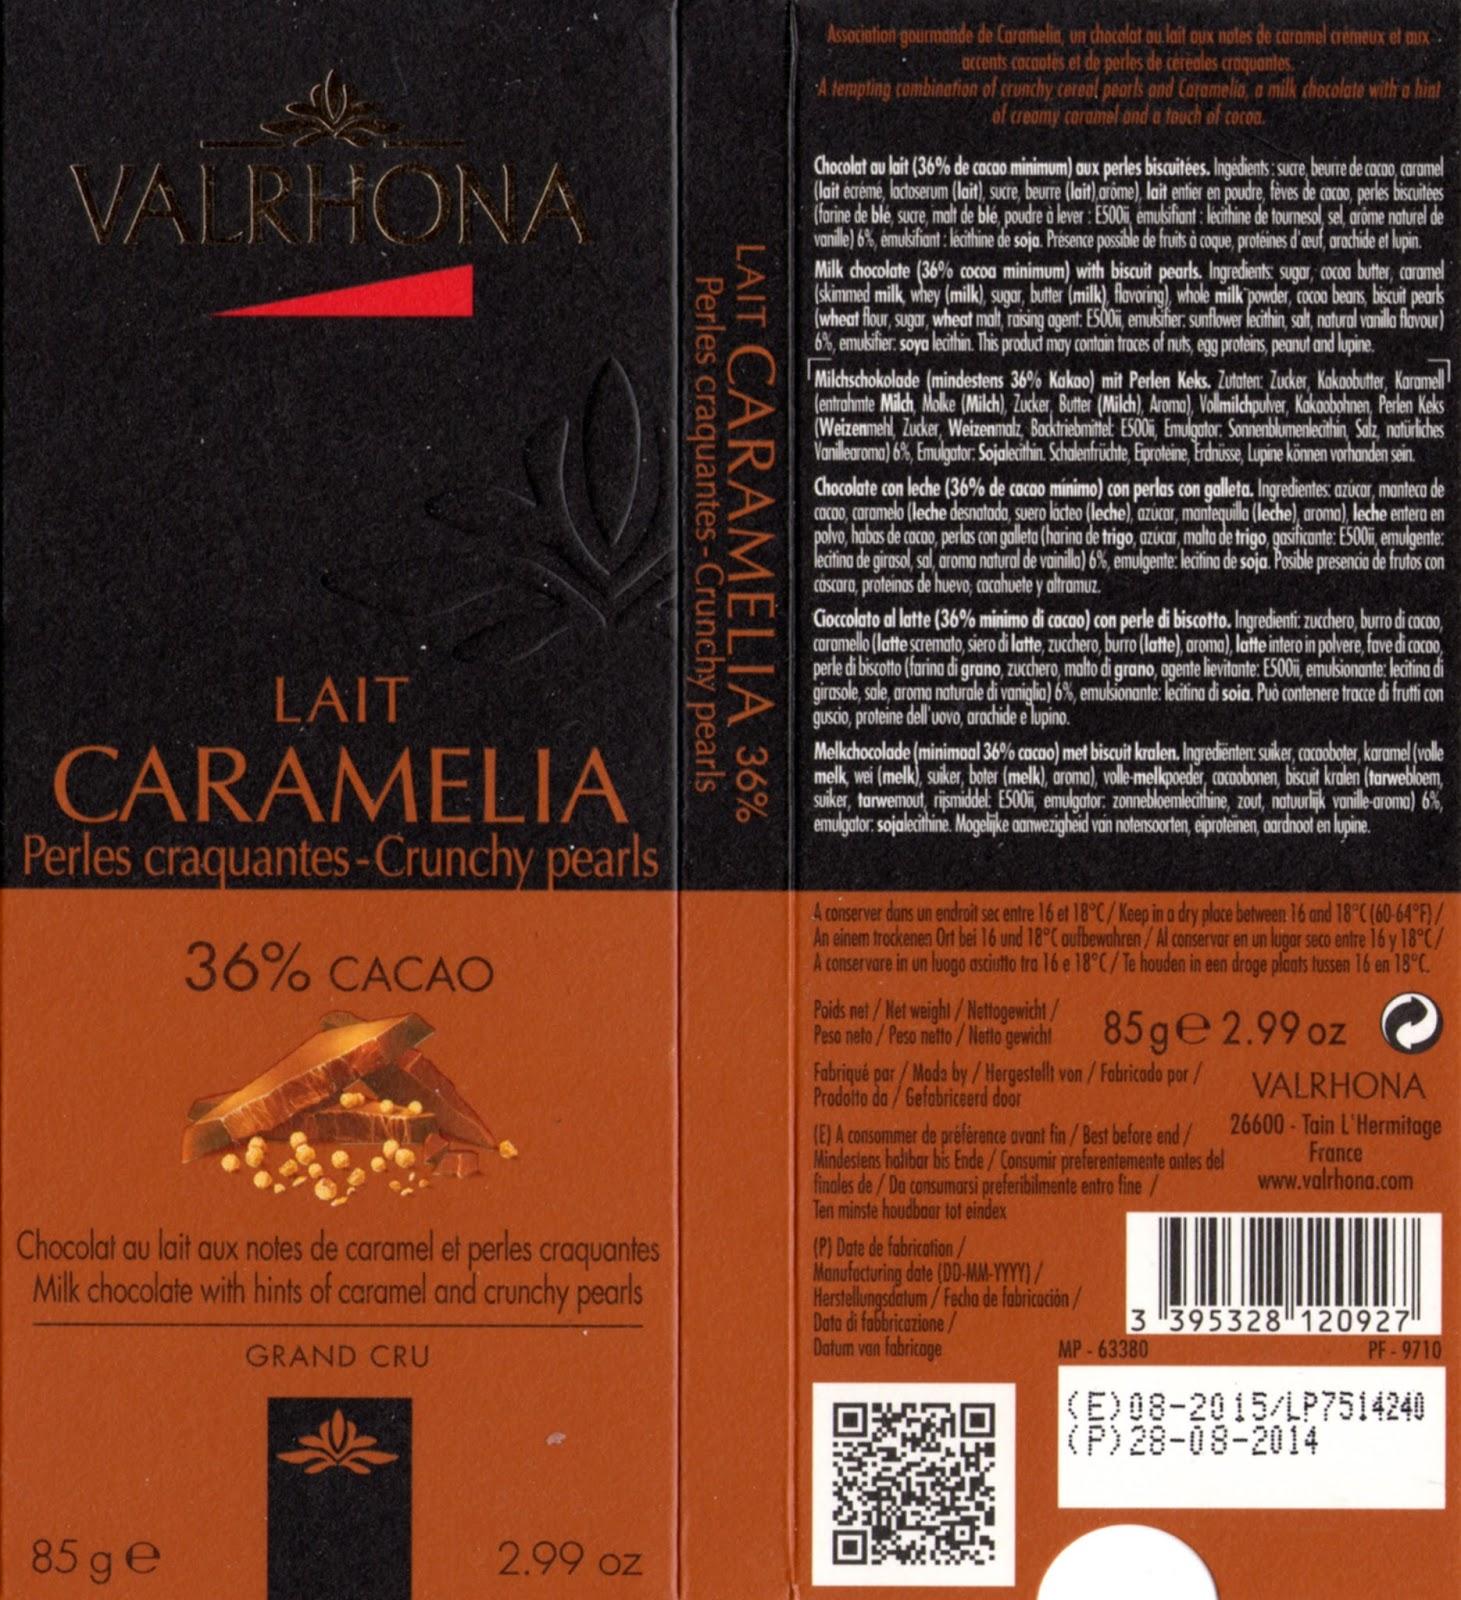 tablette de chocolat lait gourmand valrhona lait caramelia perles craquantes 36